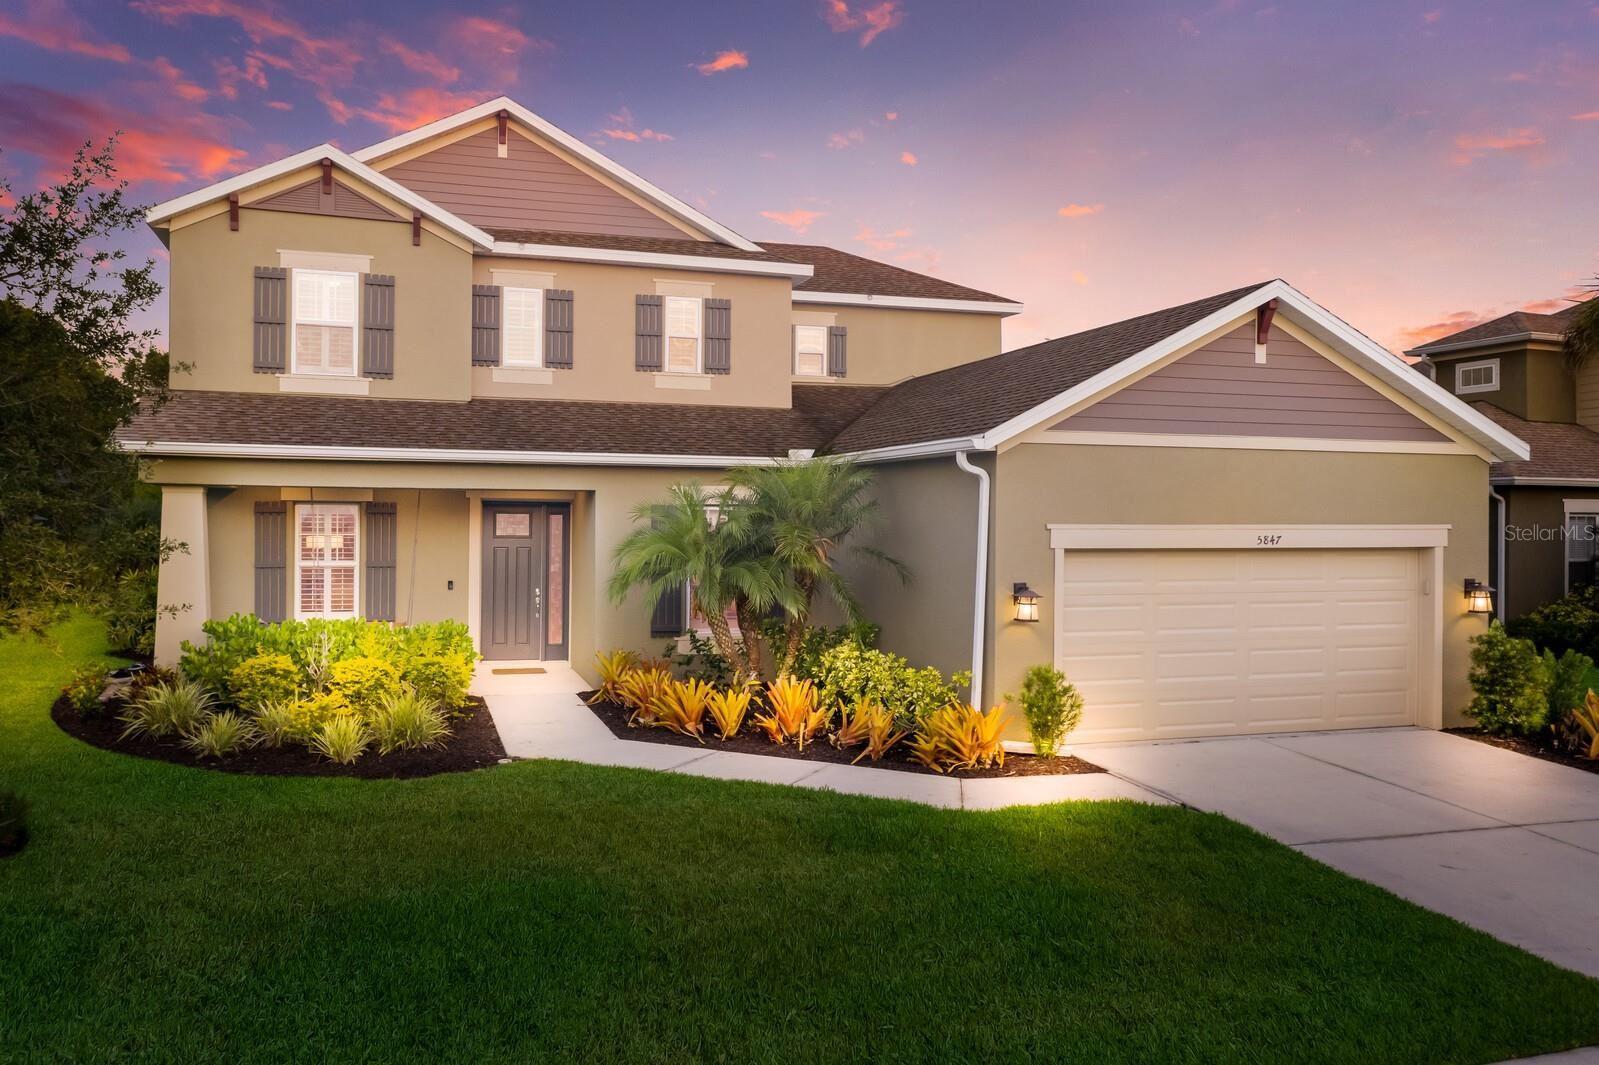 5847 PALMER RANCH PARKWAY, Sarasota, FL 34238 - #: A4502368